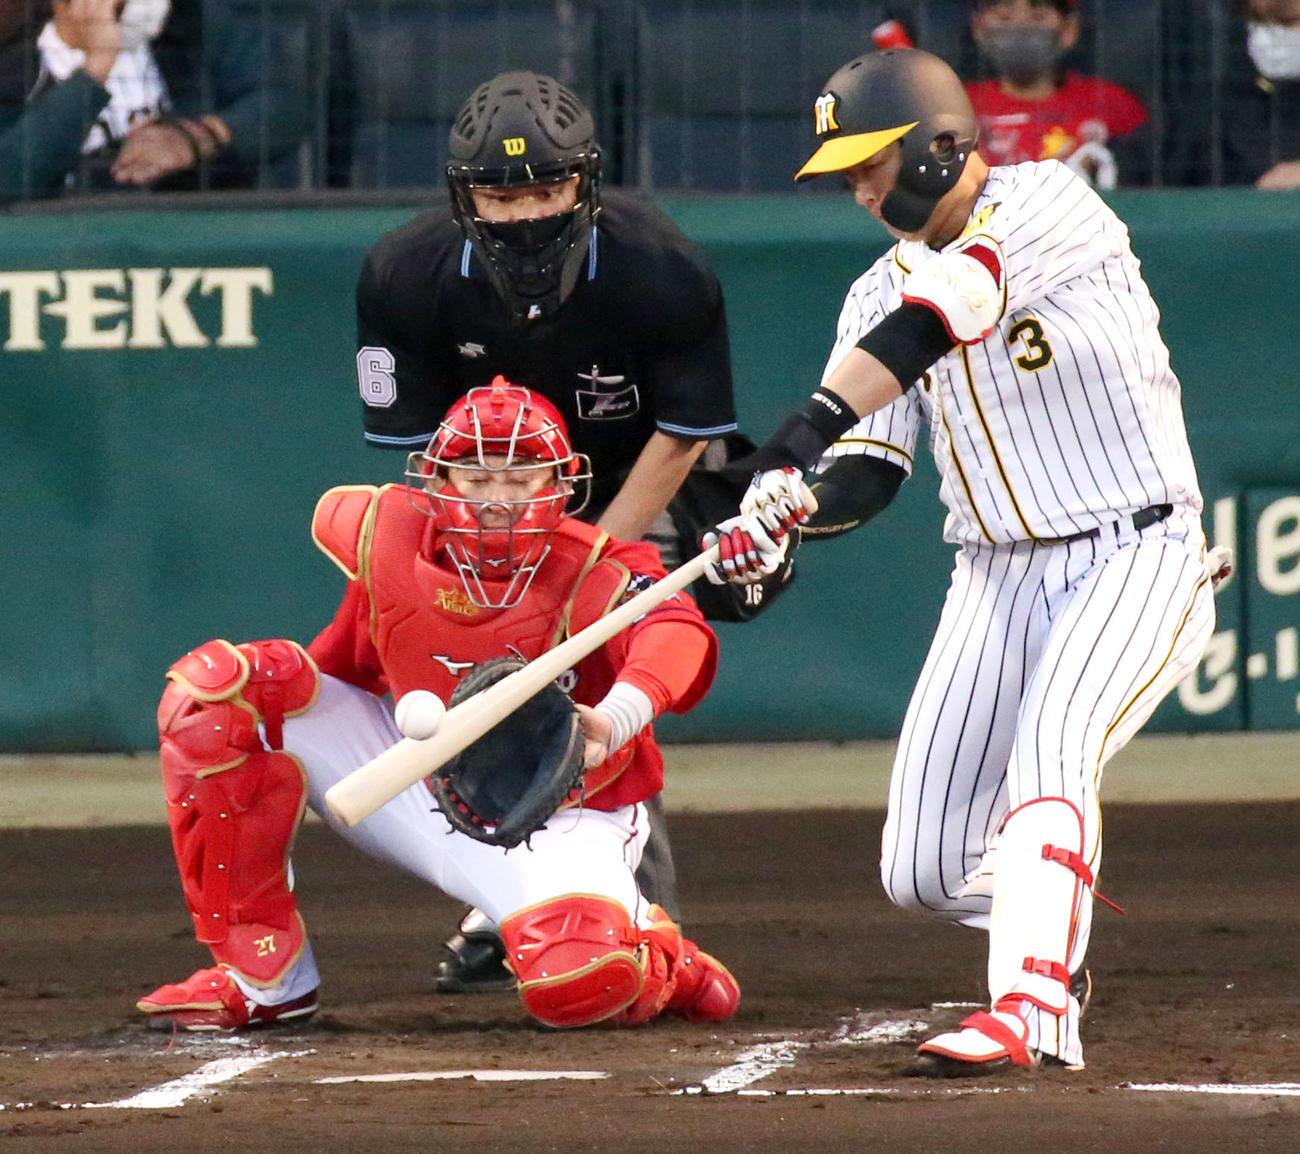 阪神対広島 1回裏阪神2死一塁、大山は左越え2点本塁打を放つ(撮影・上山淳一)